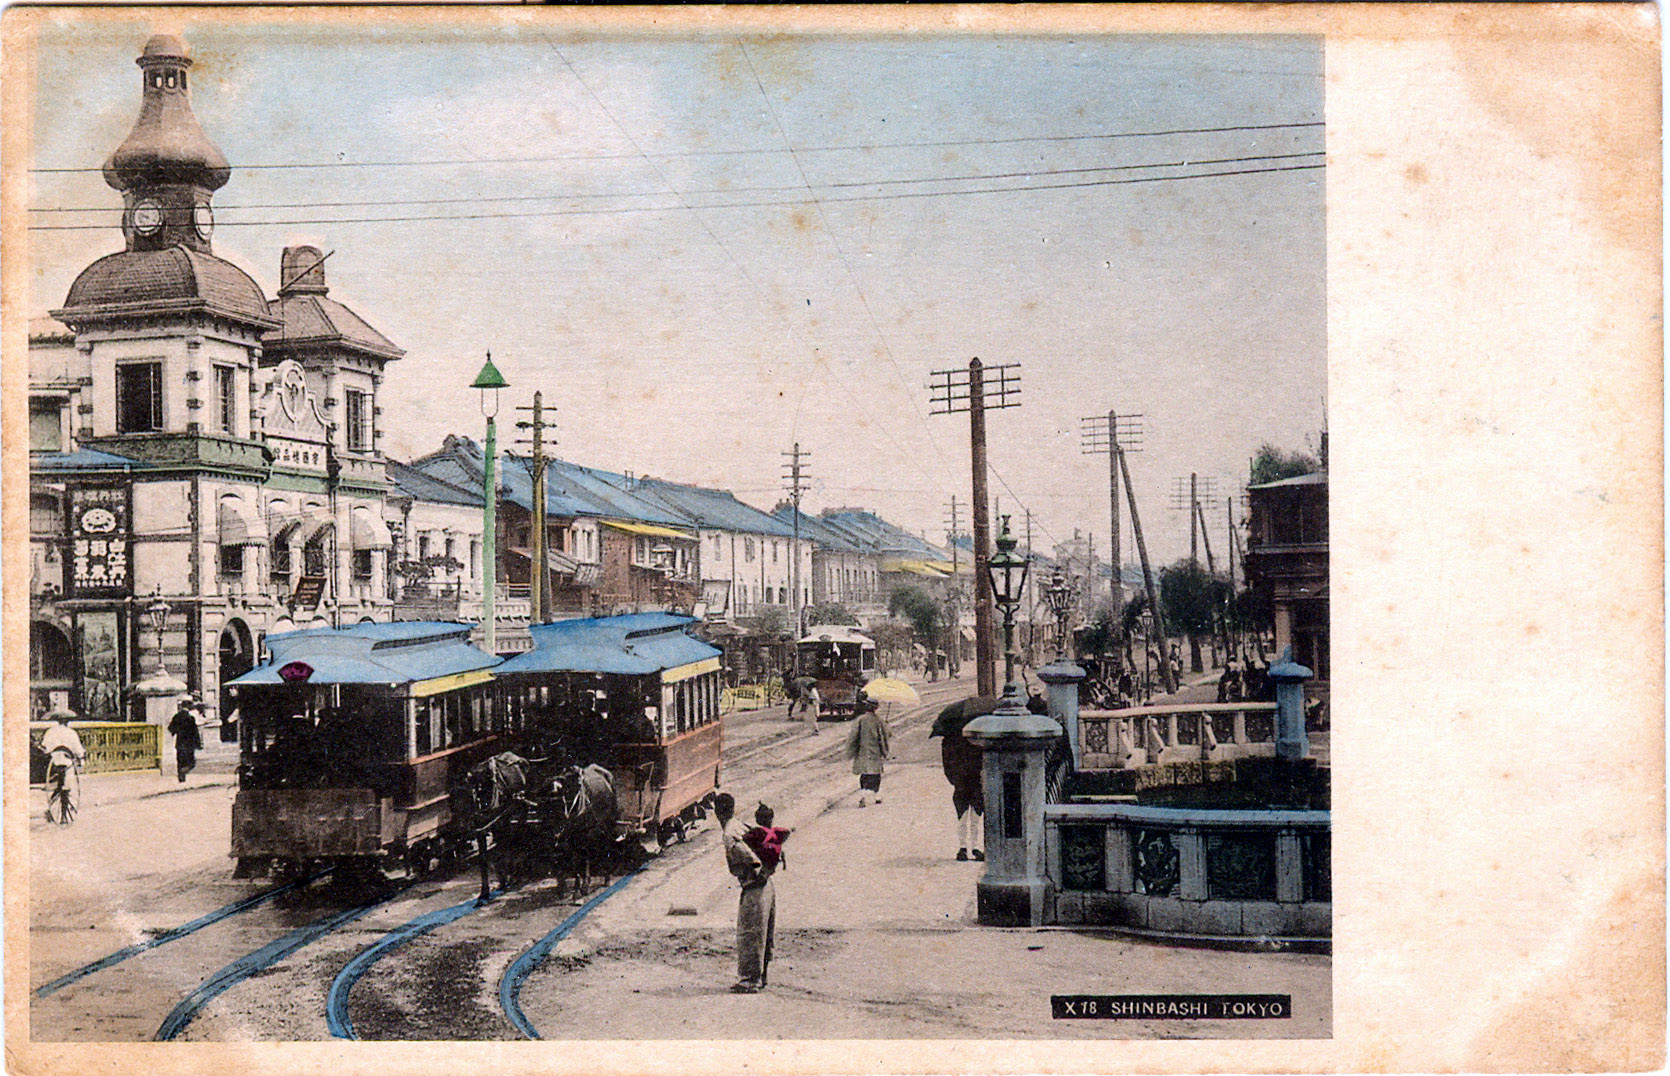 Shimbashi District 1900 1950 Old Tokyo